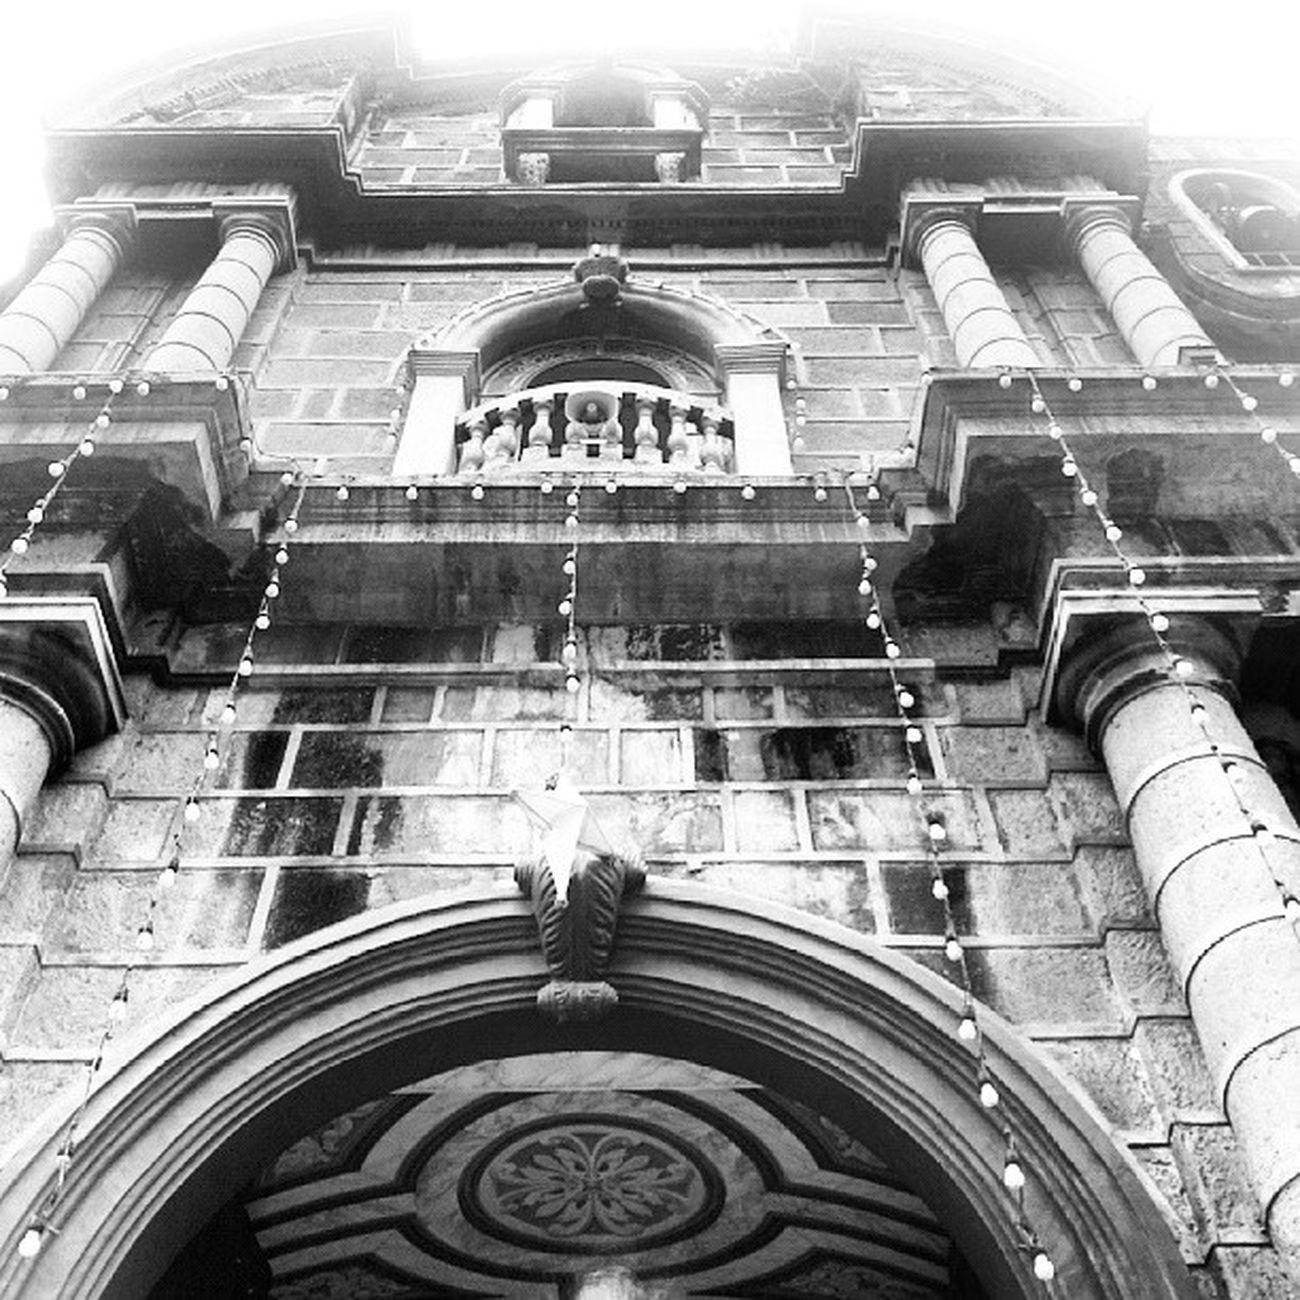 """Sts. Peter & Paul Parish Church, Makati, Philippines."" Artphoto_bw Architecture Bws_artist_asia Bwstylesgf Bnw_life Bnwalma Bnw_worldwide Bws_worldwide Bnw_captures Buildingstylesgf Bnw_wonderful Cafe_noir Dailythemes Gf_philippines Globe_travel Global_hotshotz Gang_family Walkwaywhy Webstagram Instagram Ig_philippines Ig_asia Ig_fotogramers Insta_crew Instatravel jj mybest_stillLife mybest_bw philippines phototag_it"